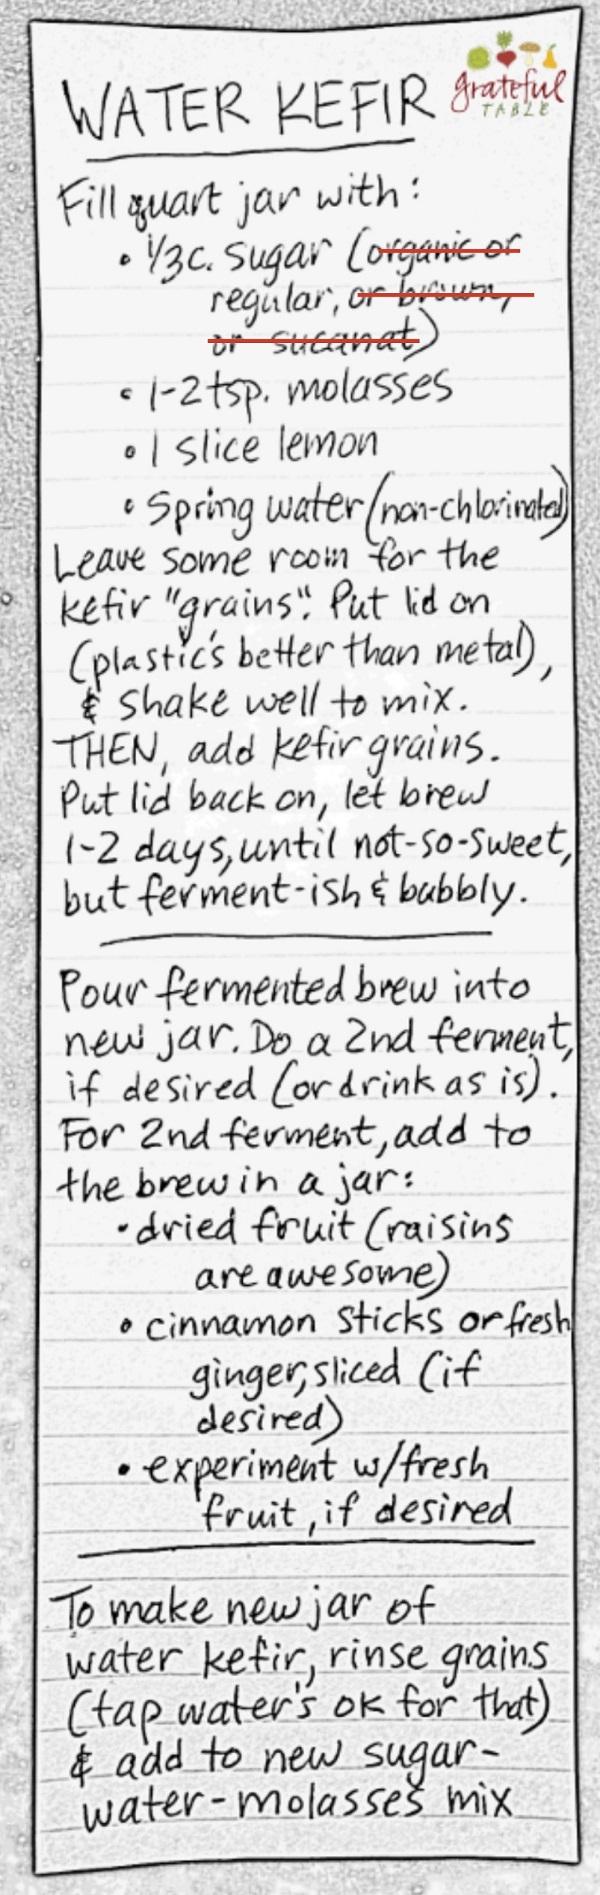 Grateful-Table-Directions-Kefir-Water-Probiotics